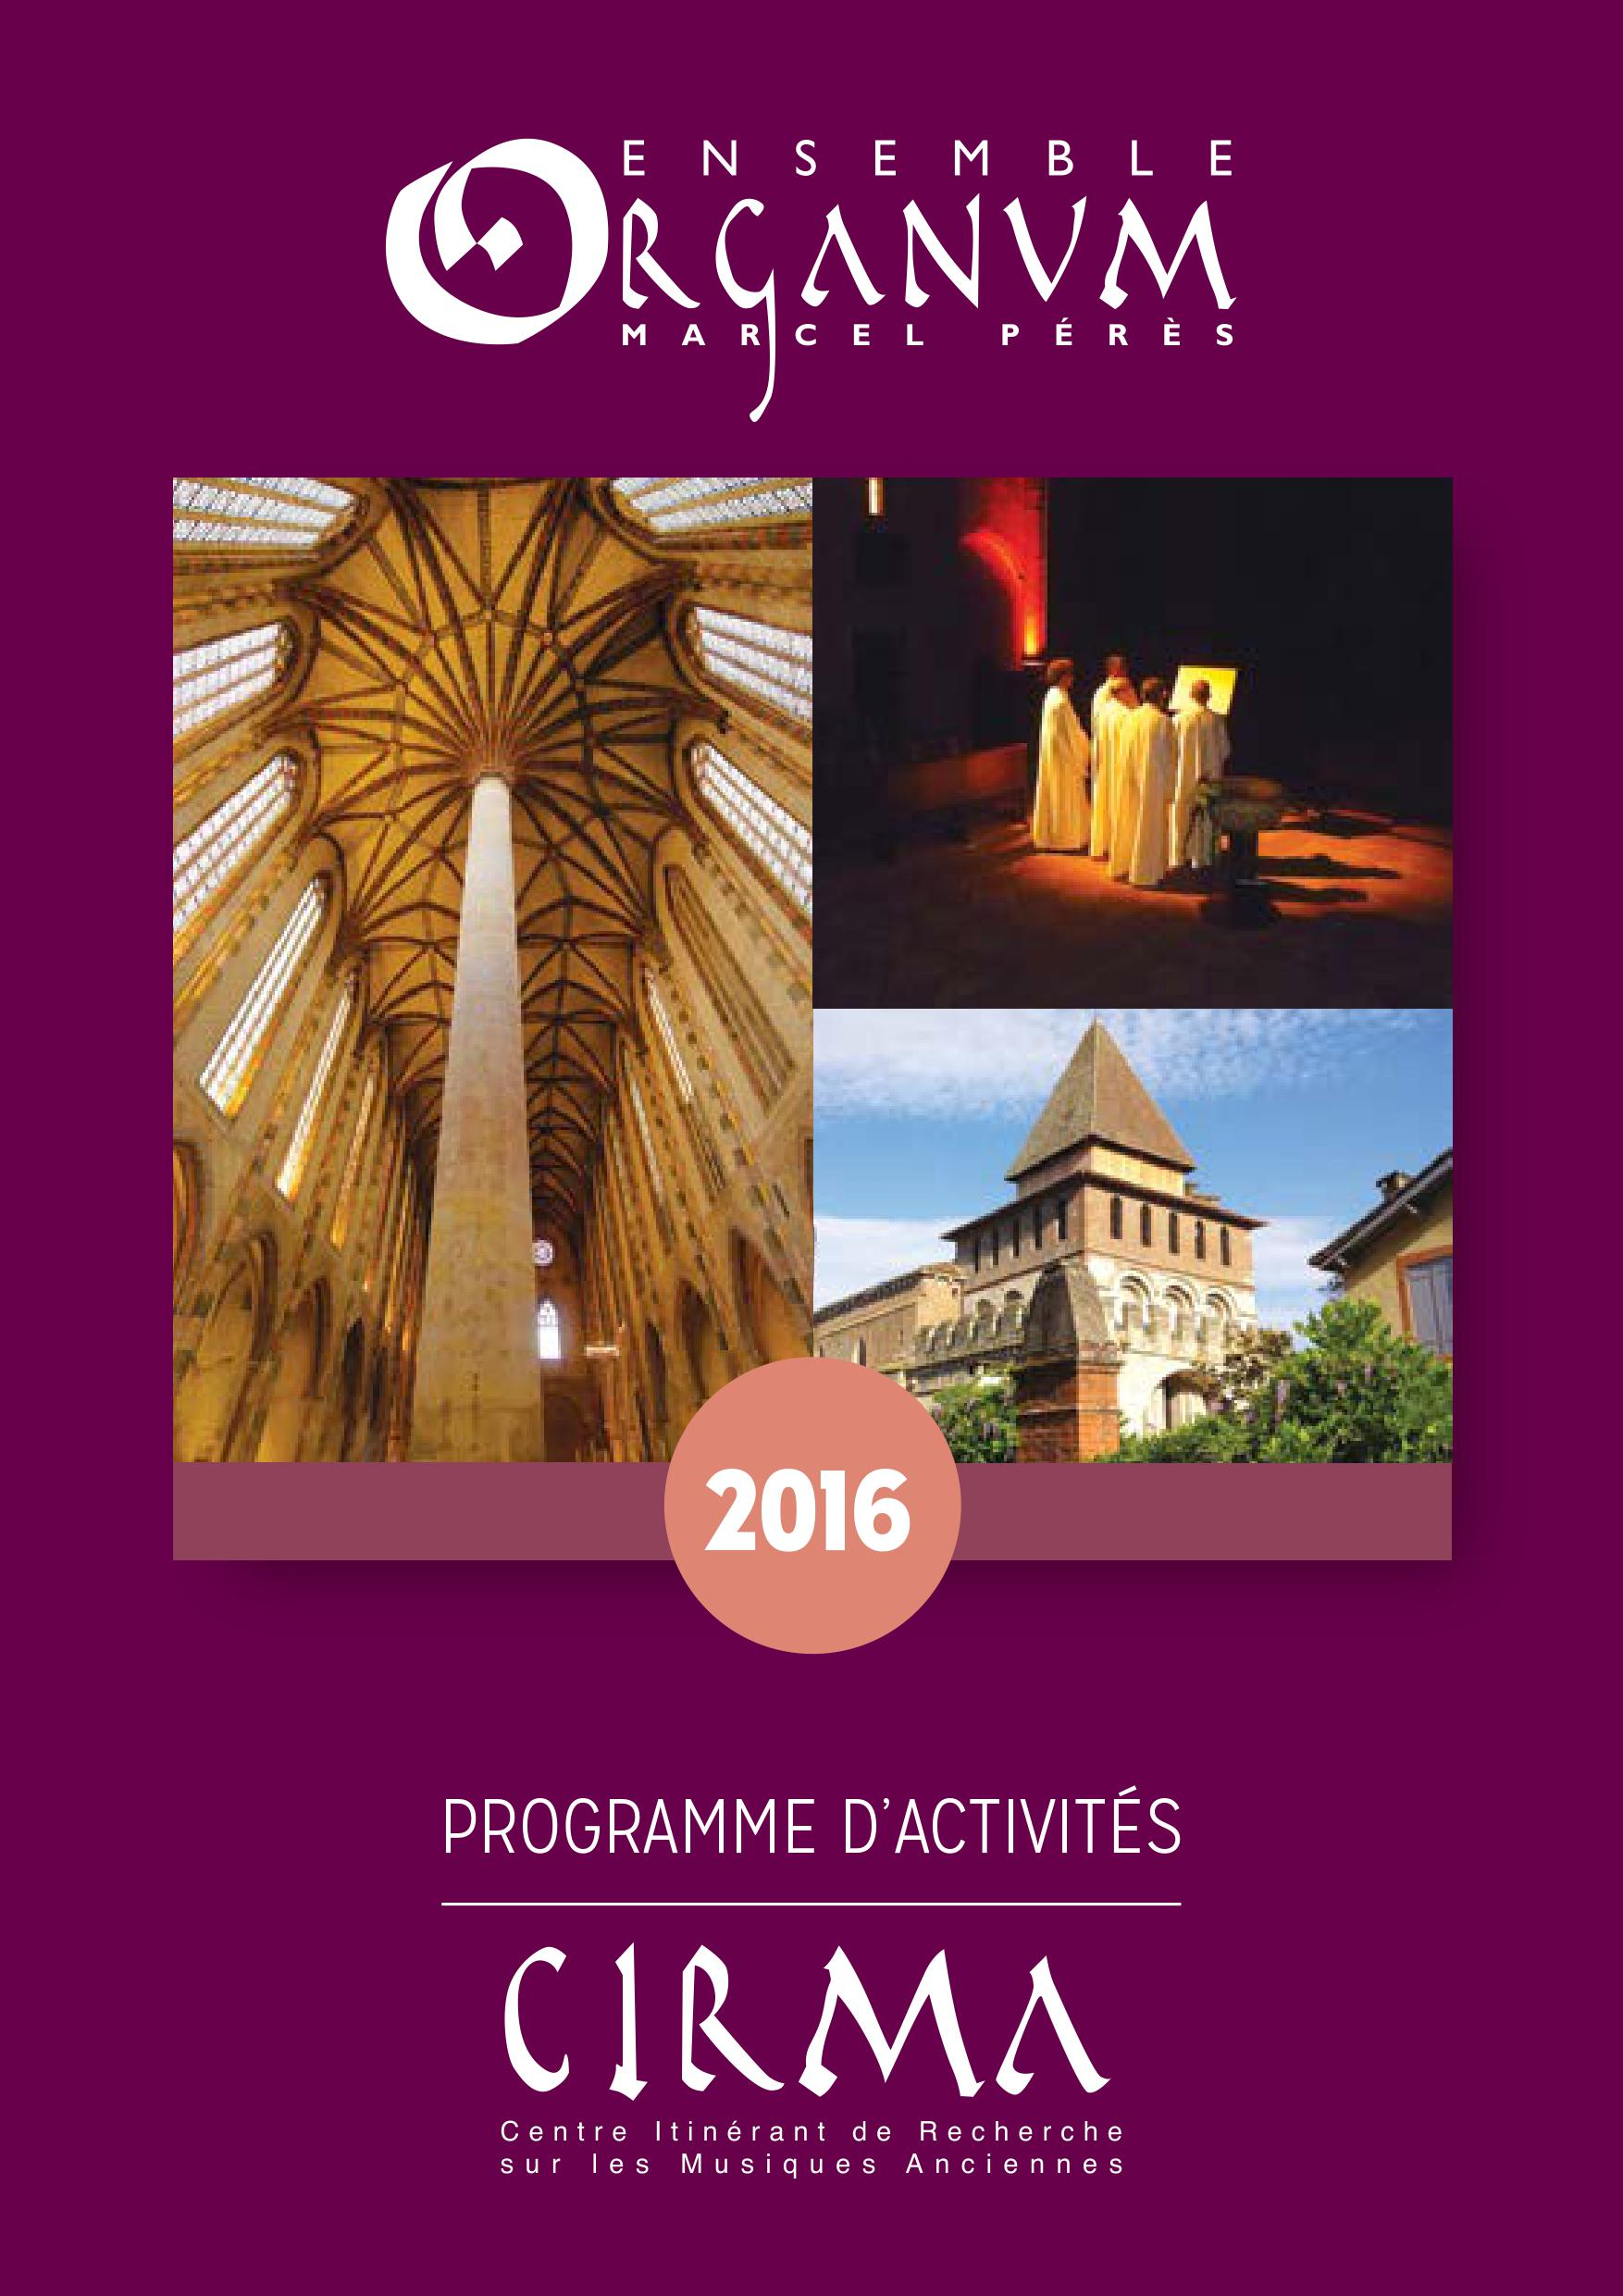 Organum CIRMA - Programme d'activités 2016